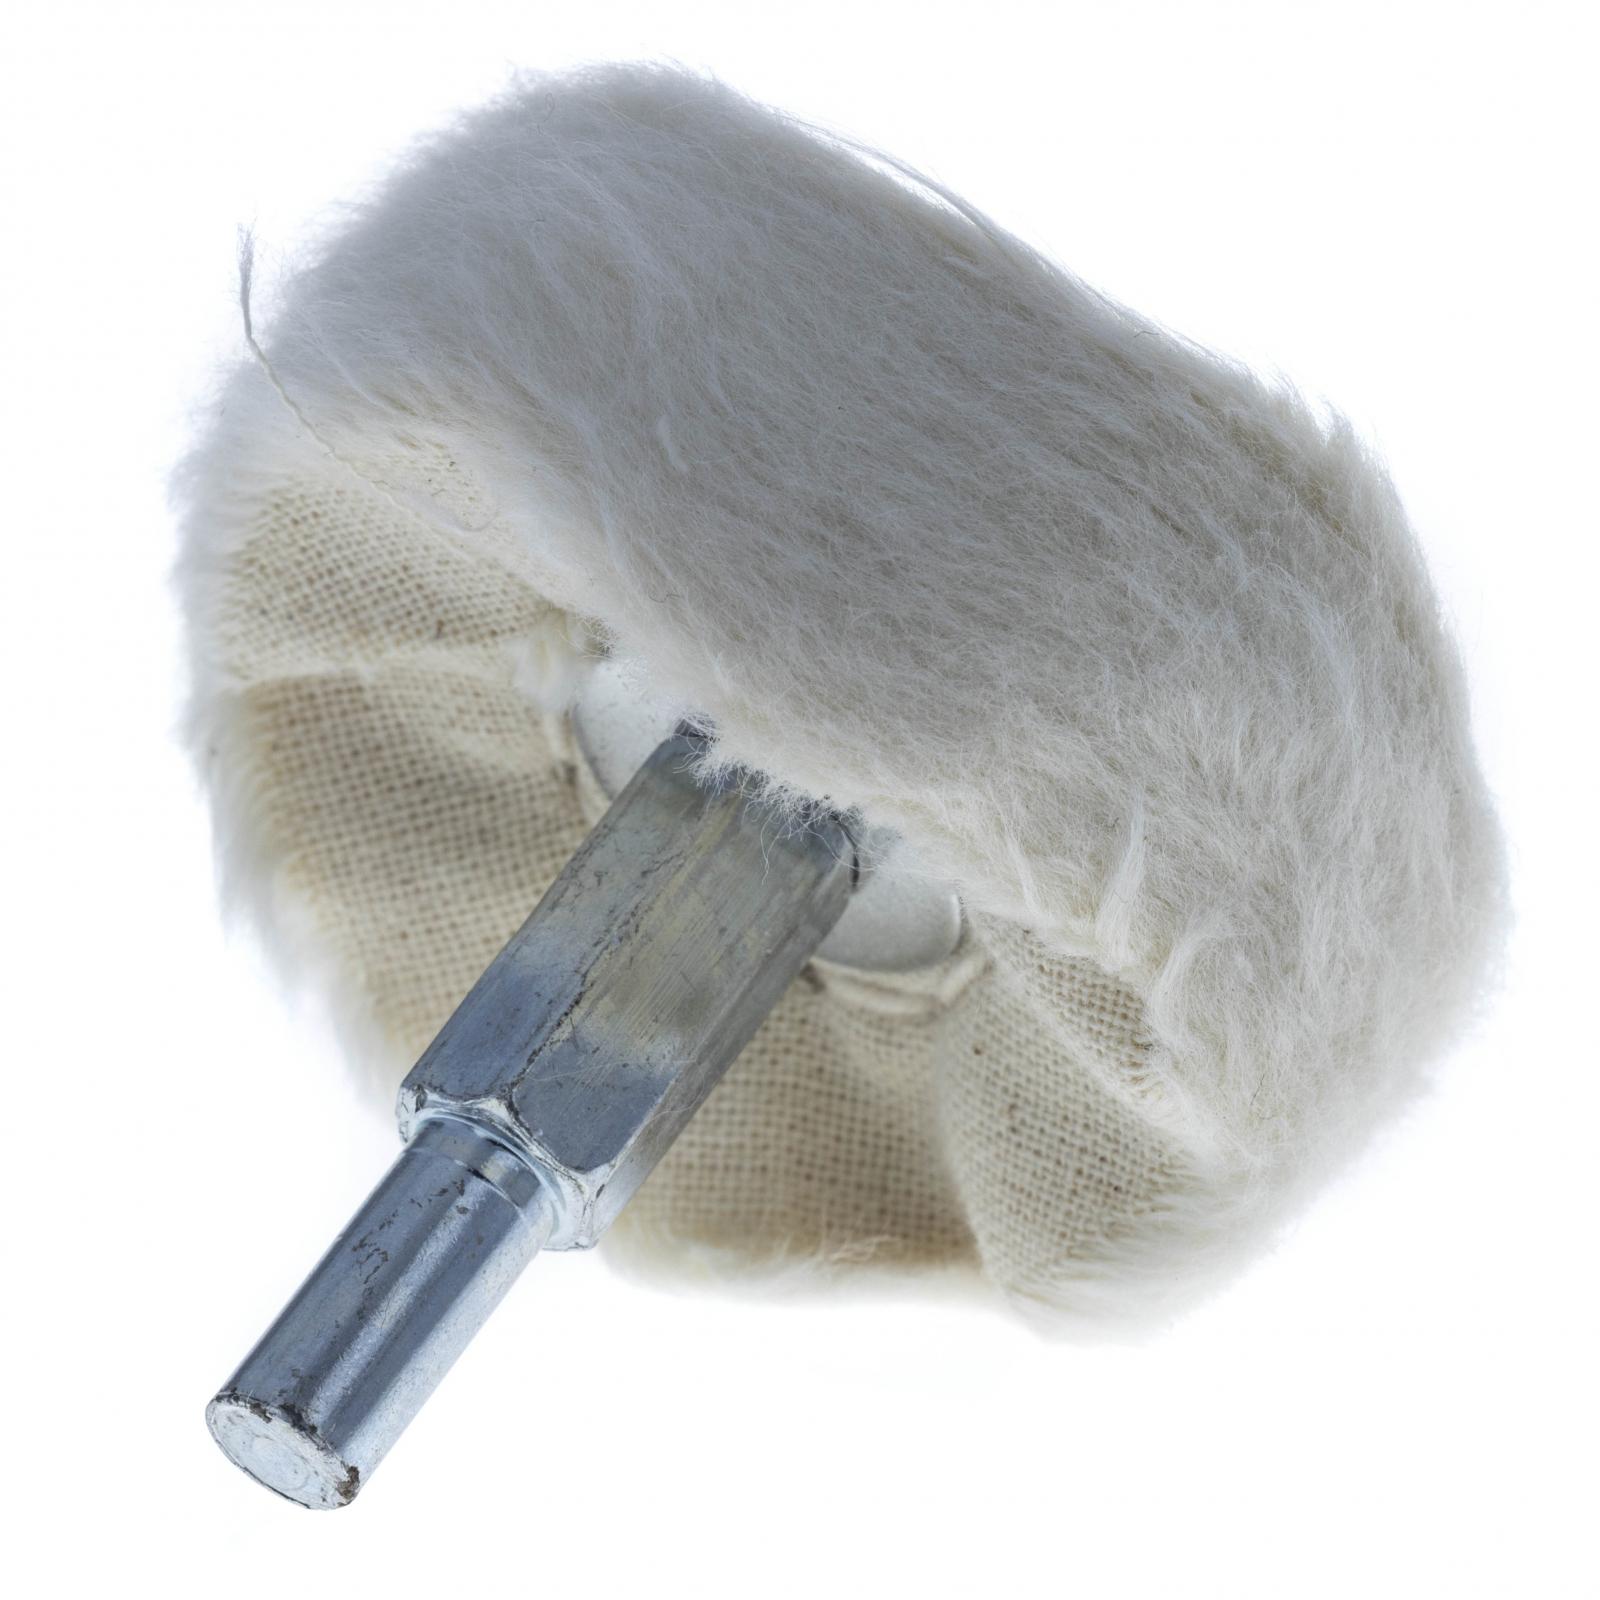 Universal Tool Cloth Polishing Buff Wheel 2 Inch Diameter Soft Muslin